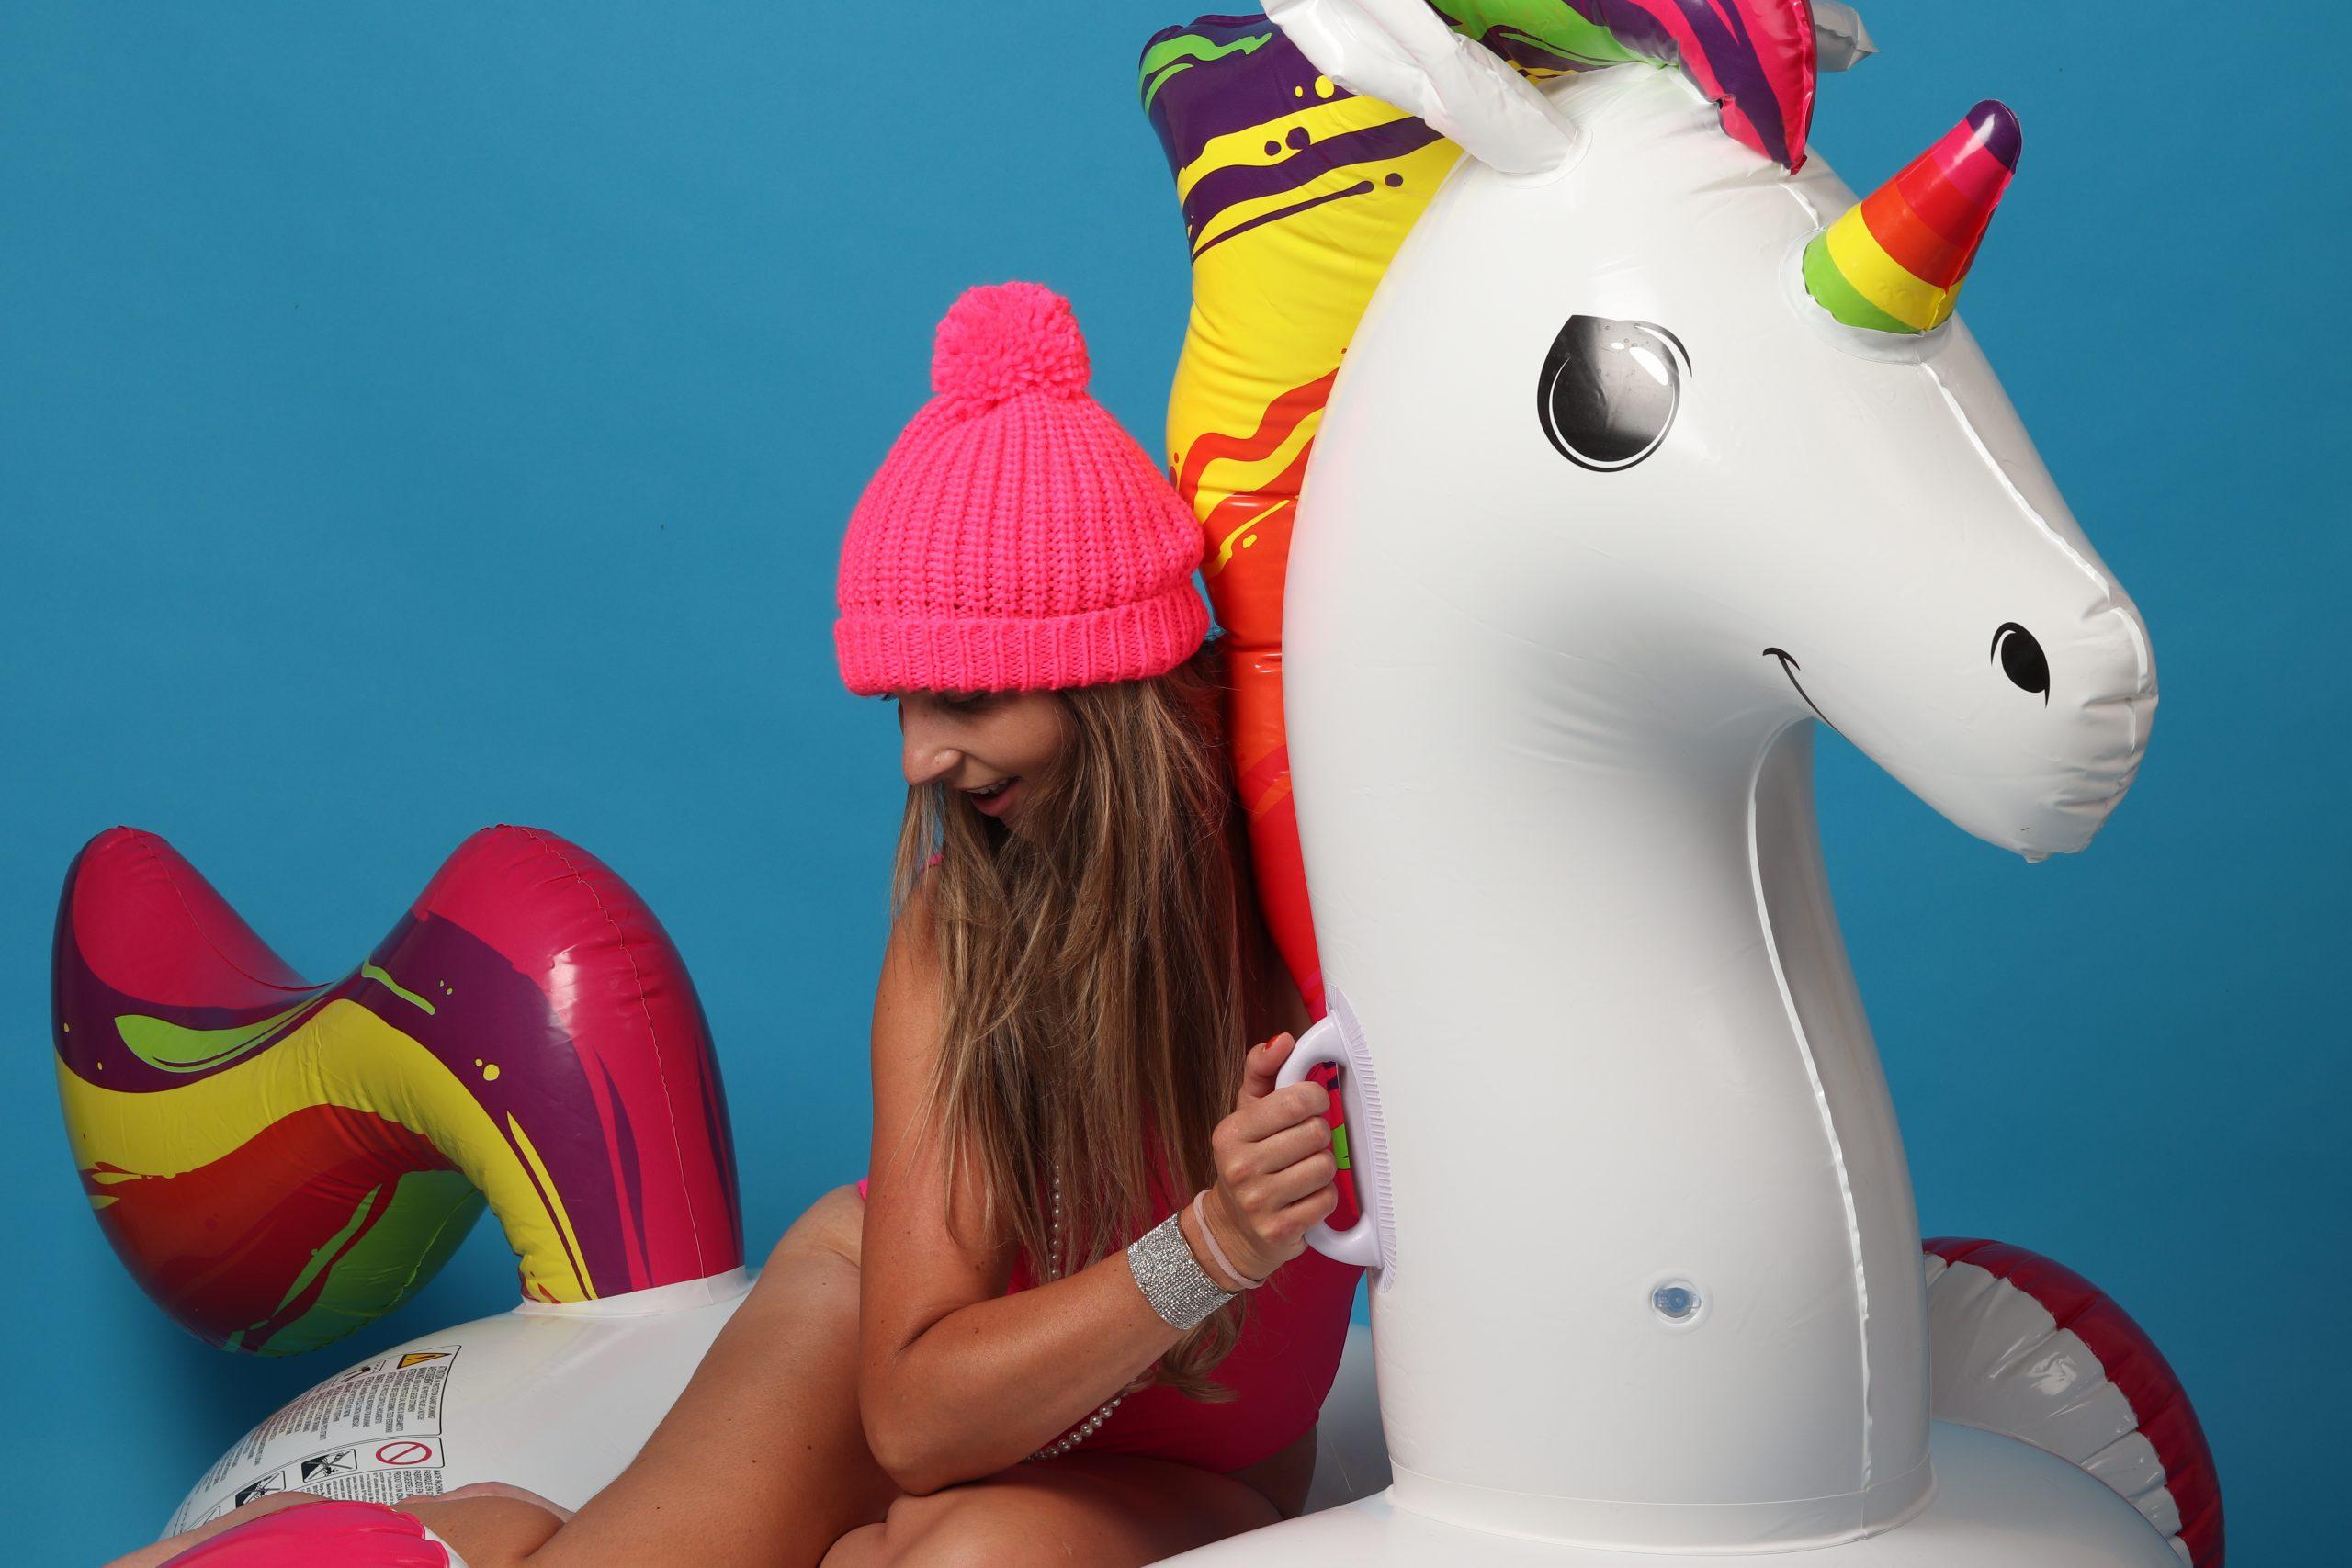 fashion mode roze astrid alida fotografie fotostudio unicorn action reinders badpak bikini muts roze opblaas inflatable parel oorbellen